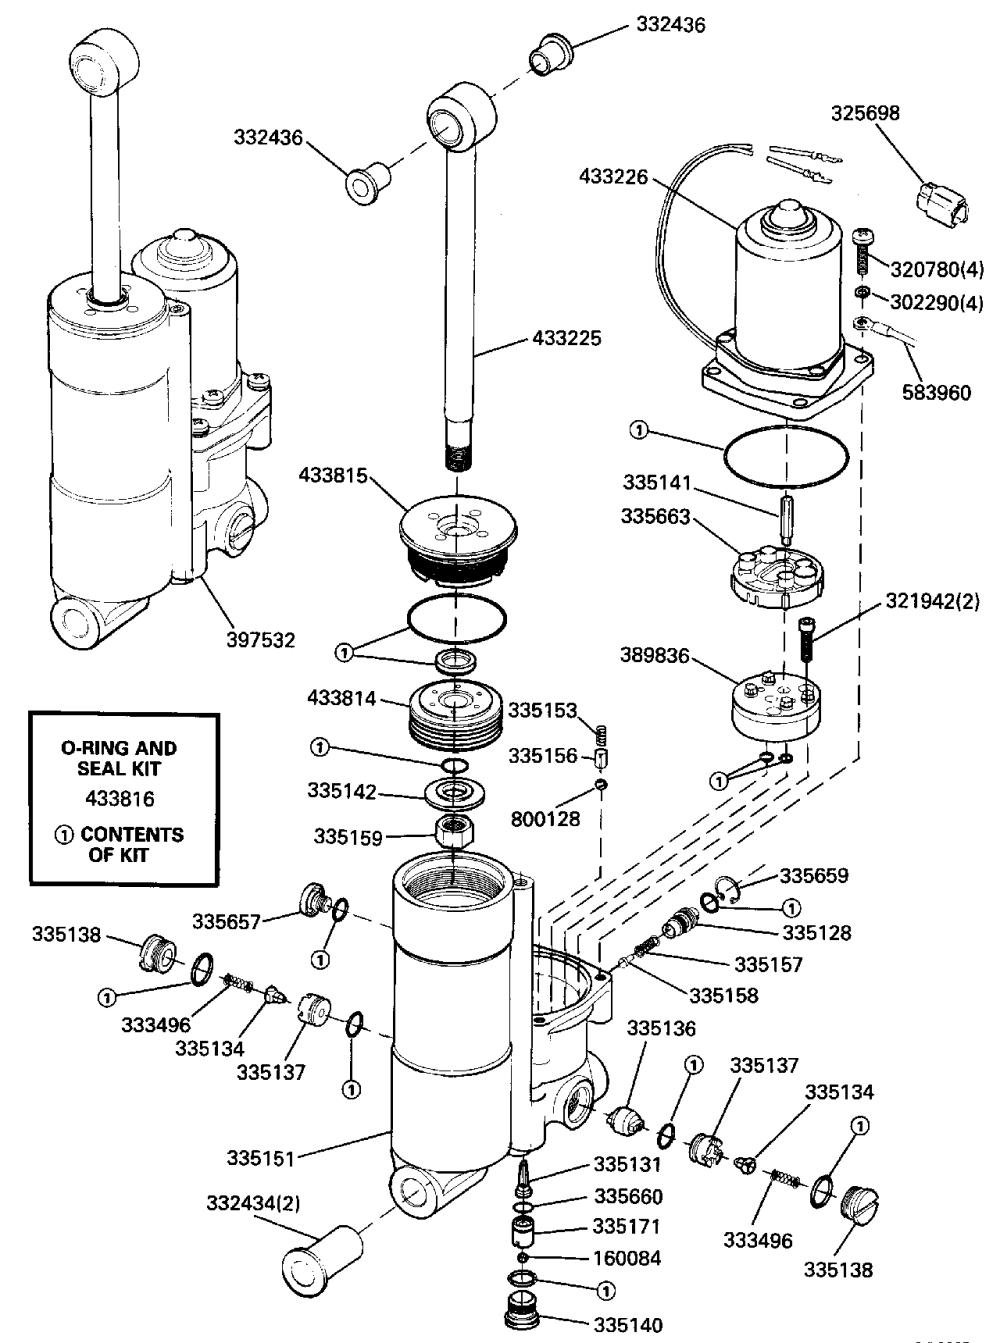 medium resolution of brp johnson en 1989 40 j40ecec 1989 power tilt trim